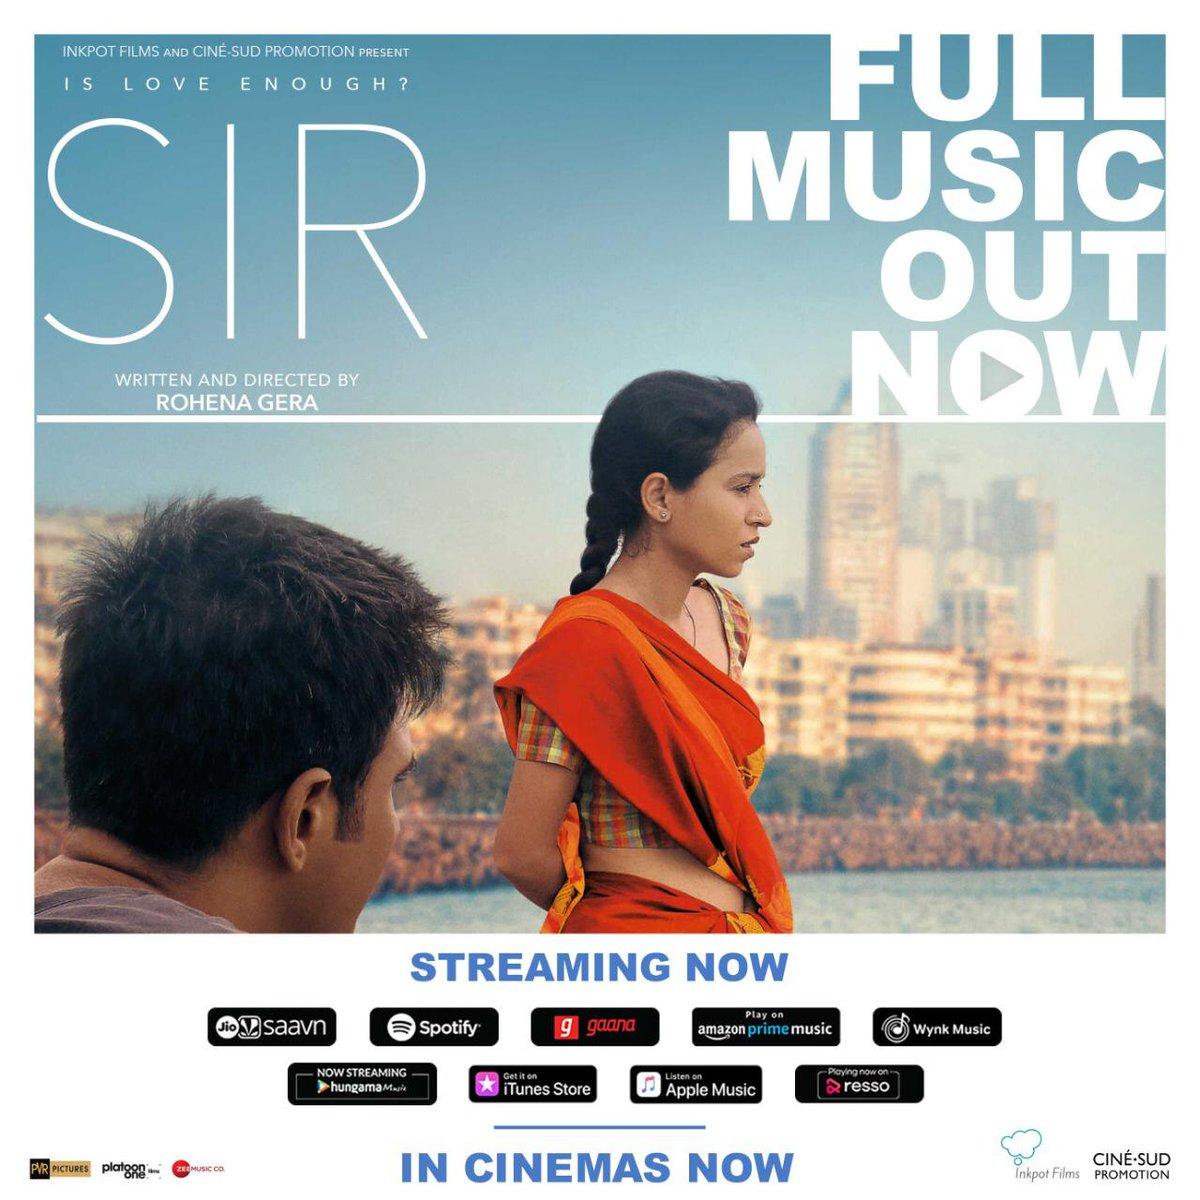 The full audio/ music of #SIRTheFilm is out now on @JioSaavn @Spotify @gaana @amazonmusic @WynkMusic @AppleMusic @iTunes etc.  Music: Ragav Vagav Lyricist: Mohit Chauhan @Mean_Wile Singers: Suvarna Tiwari, Nakash Aziz Recording/Mix Engr: Anish Gohil  Music on @ZeeMusicCompany